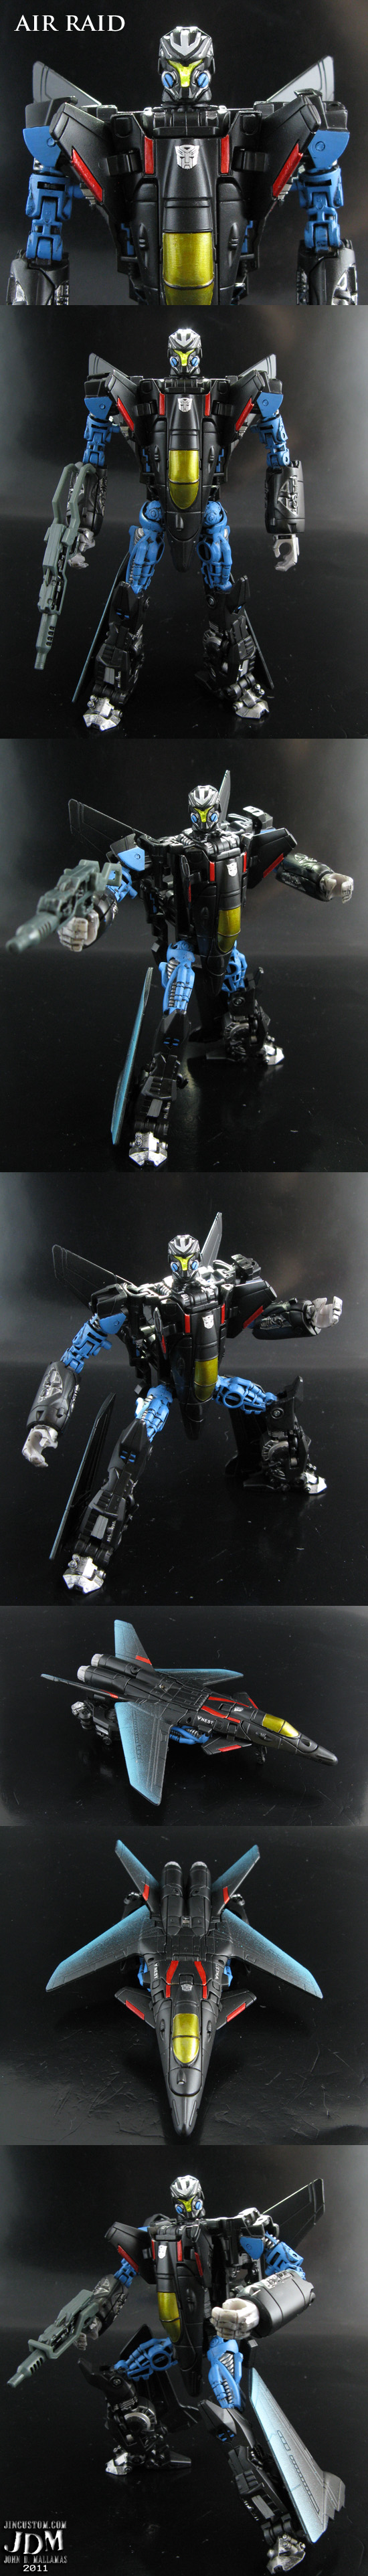 Cyberjet Air Raid by Jin-Saotome